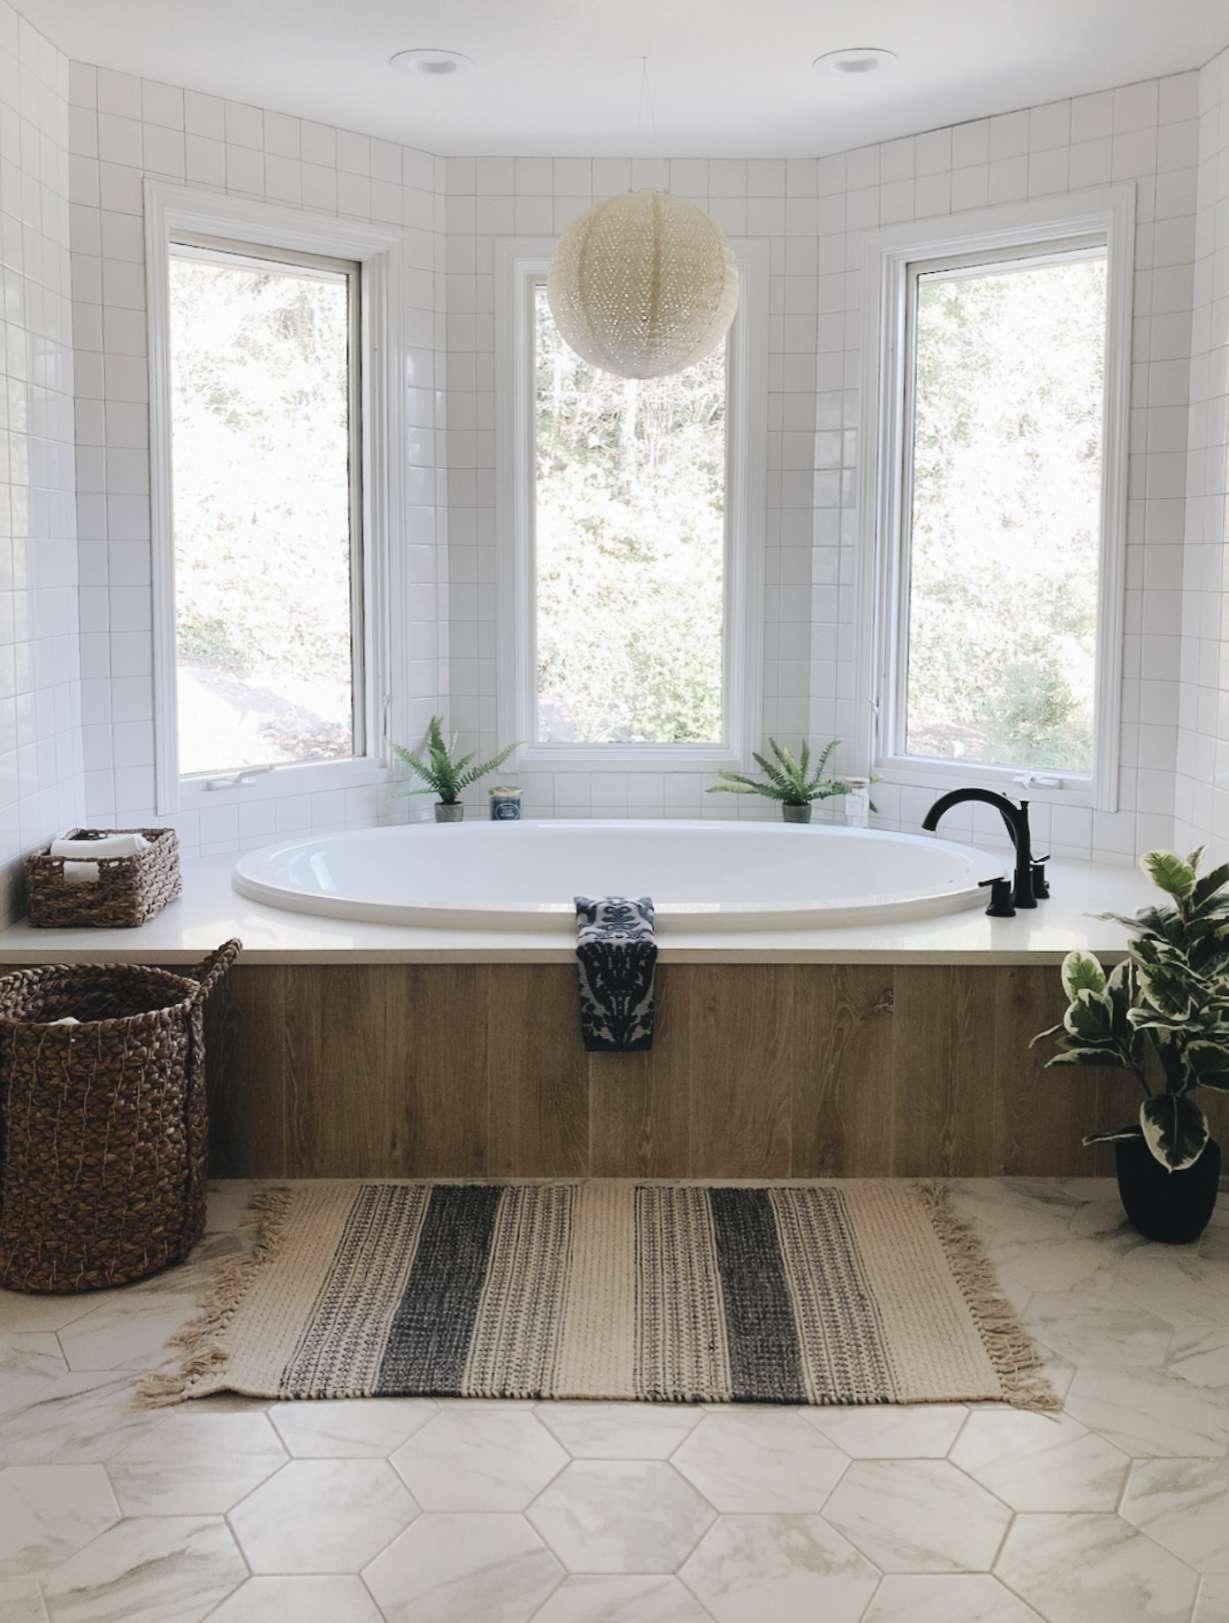 bathtub with bay windows, jute light fixture and rug